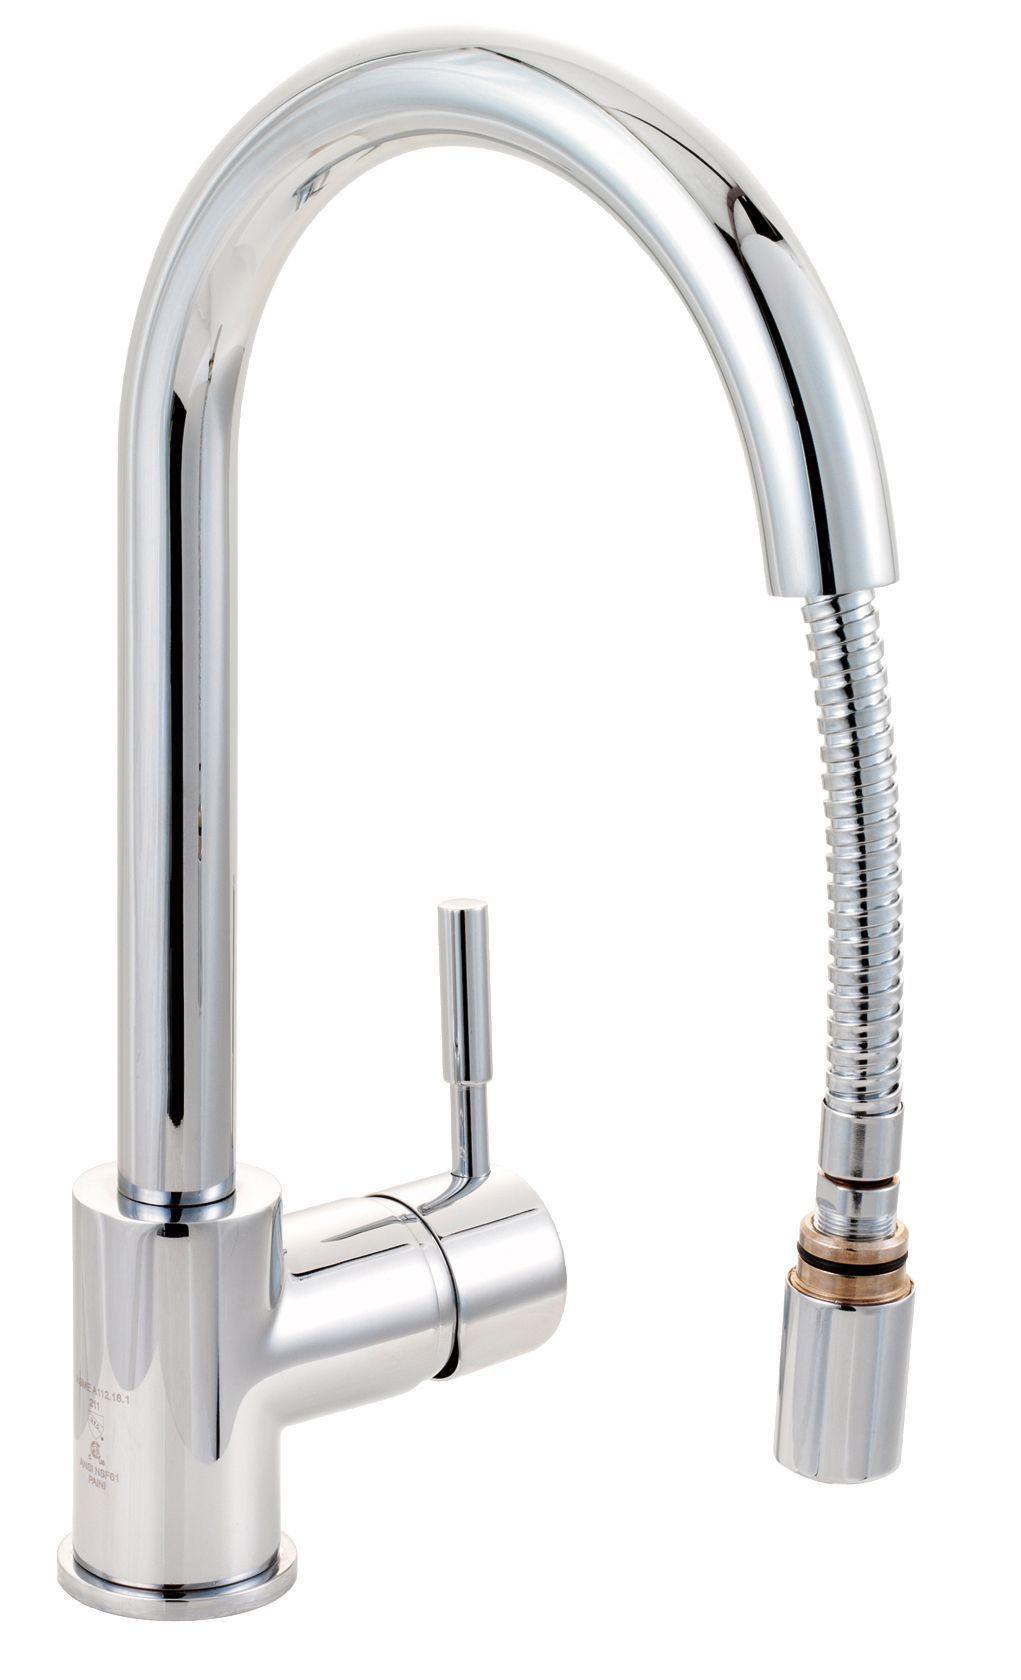 cooke lewis saru chrome effect kitchen pull out tap. Black Bedroom Furniture Sets. Home Design Ideas